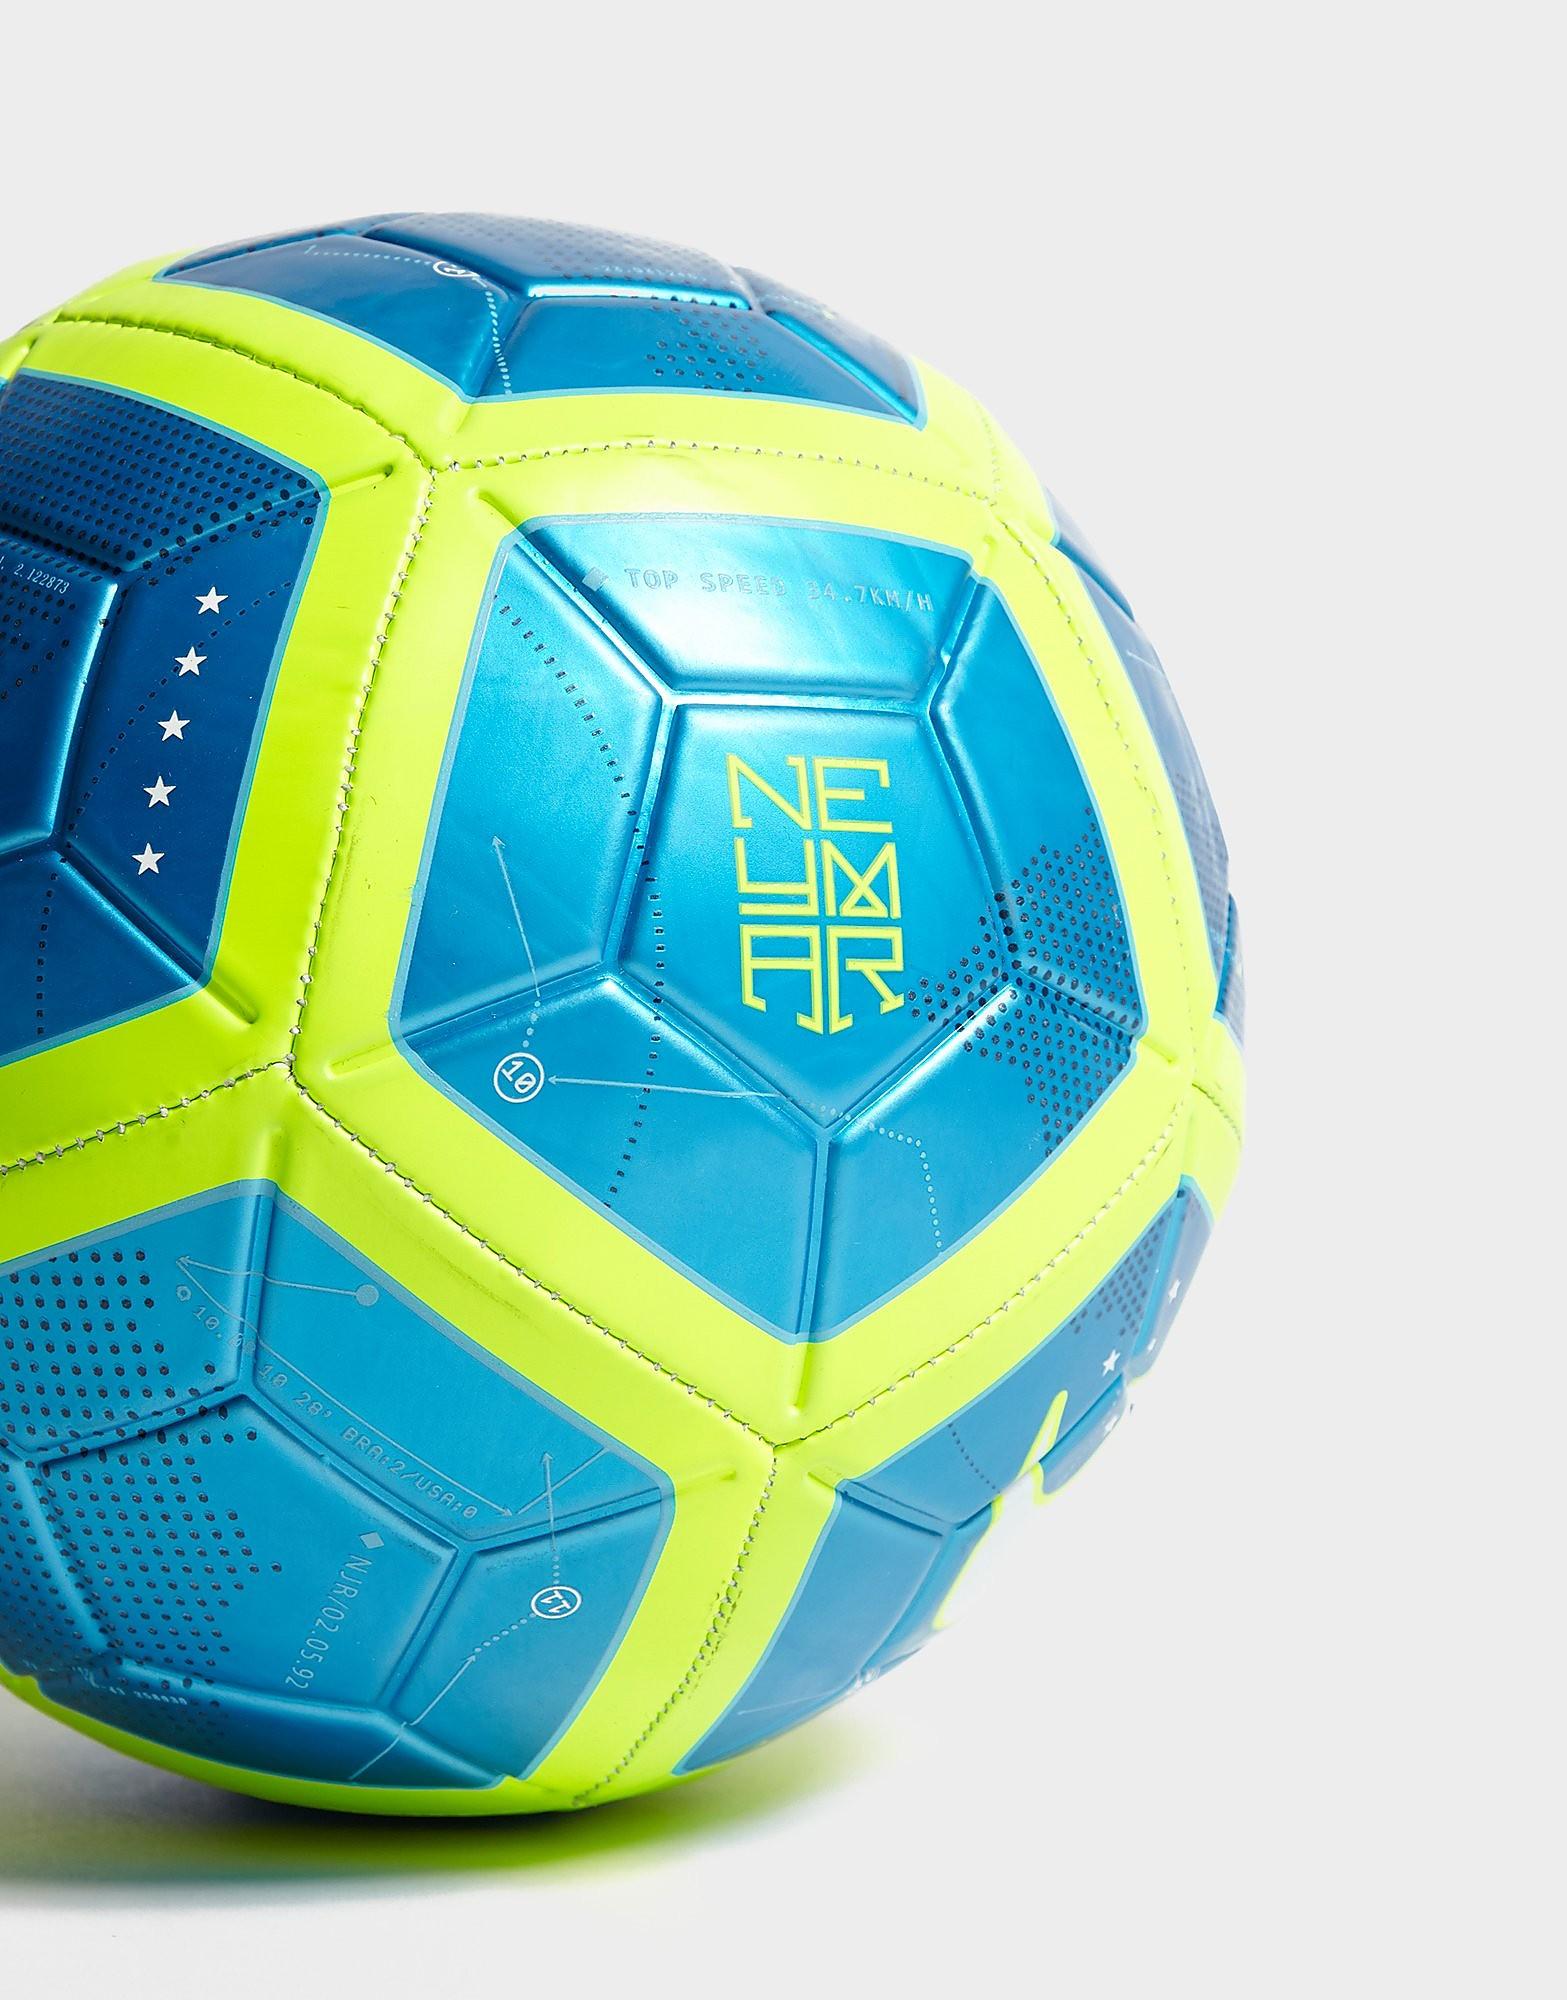 Nike Nike Neymar Football